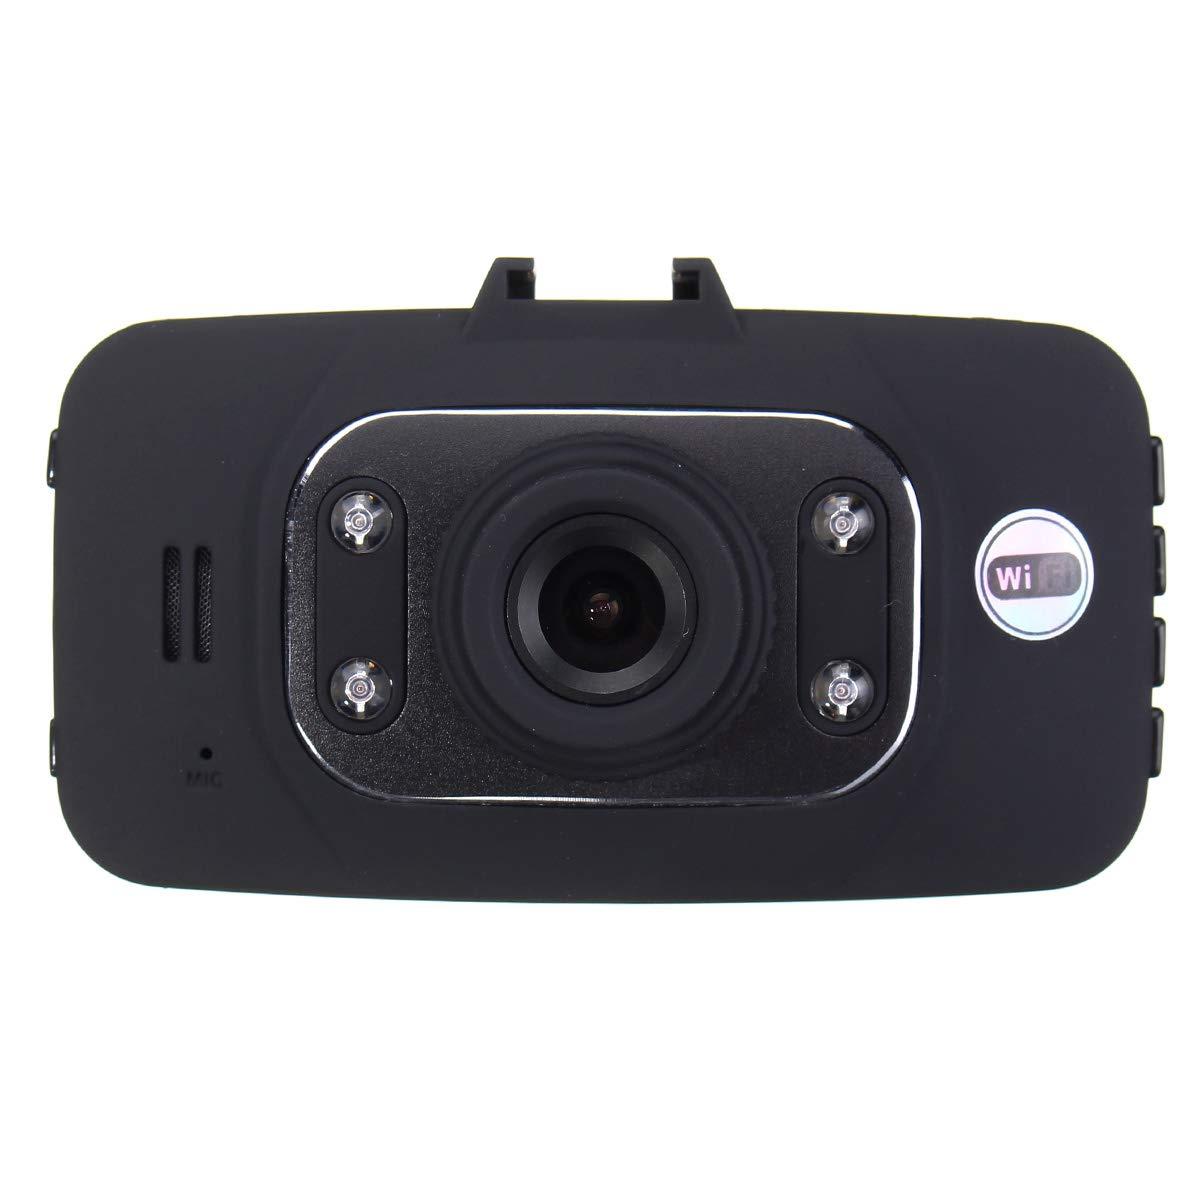 FeLiCia Gs8000 2.7 Zoll 1080P Fhd Wifi Doppelobjektiv-Auto-Kamera GPS-Schlag HD Dvr Video Recorder